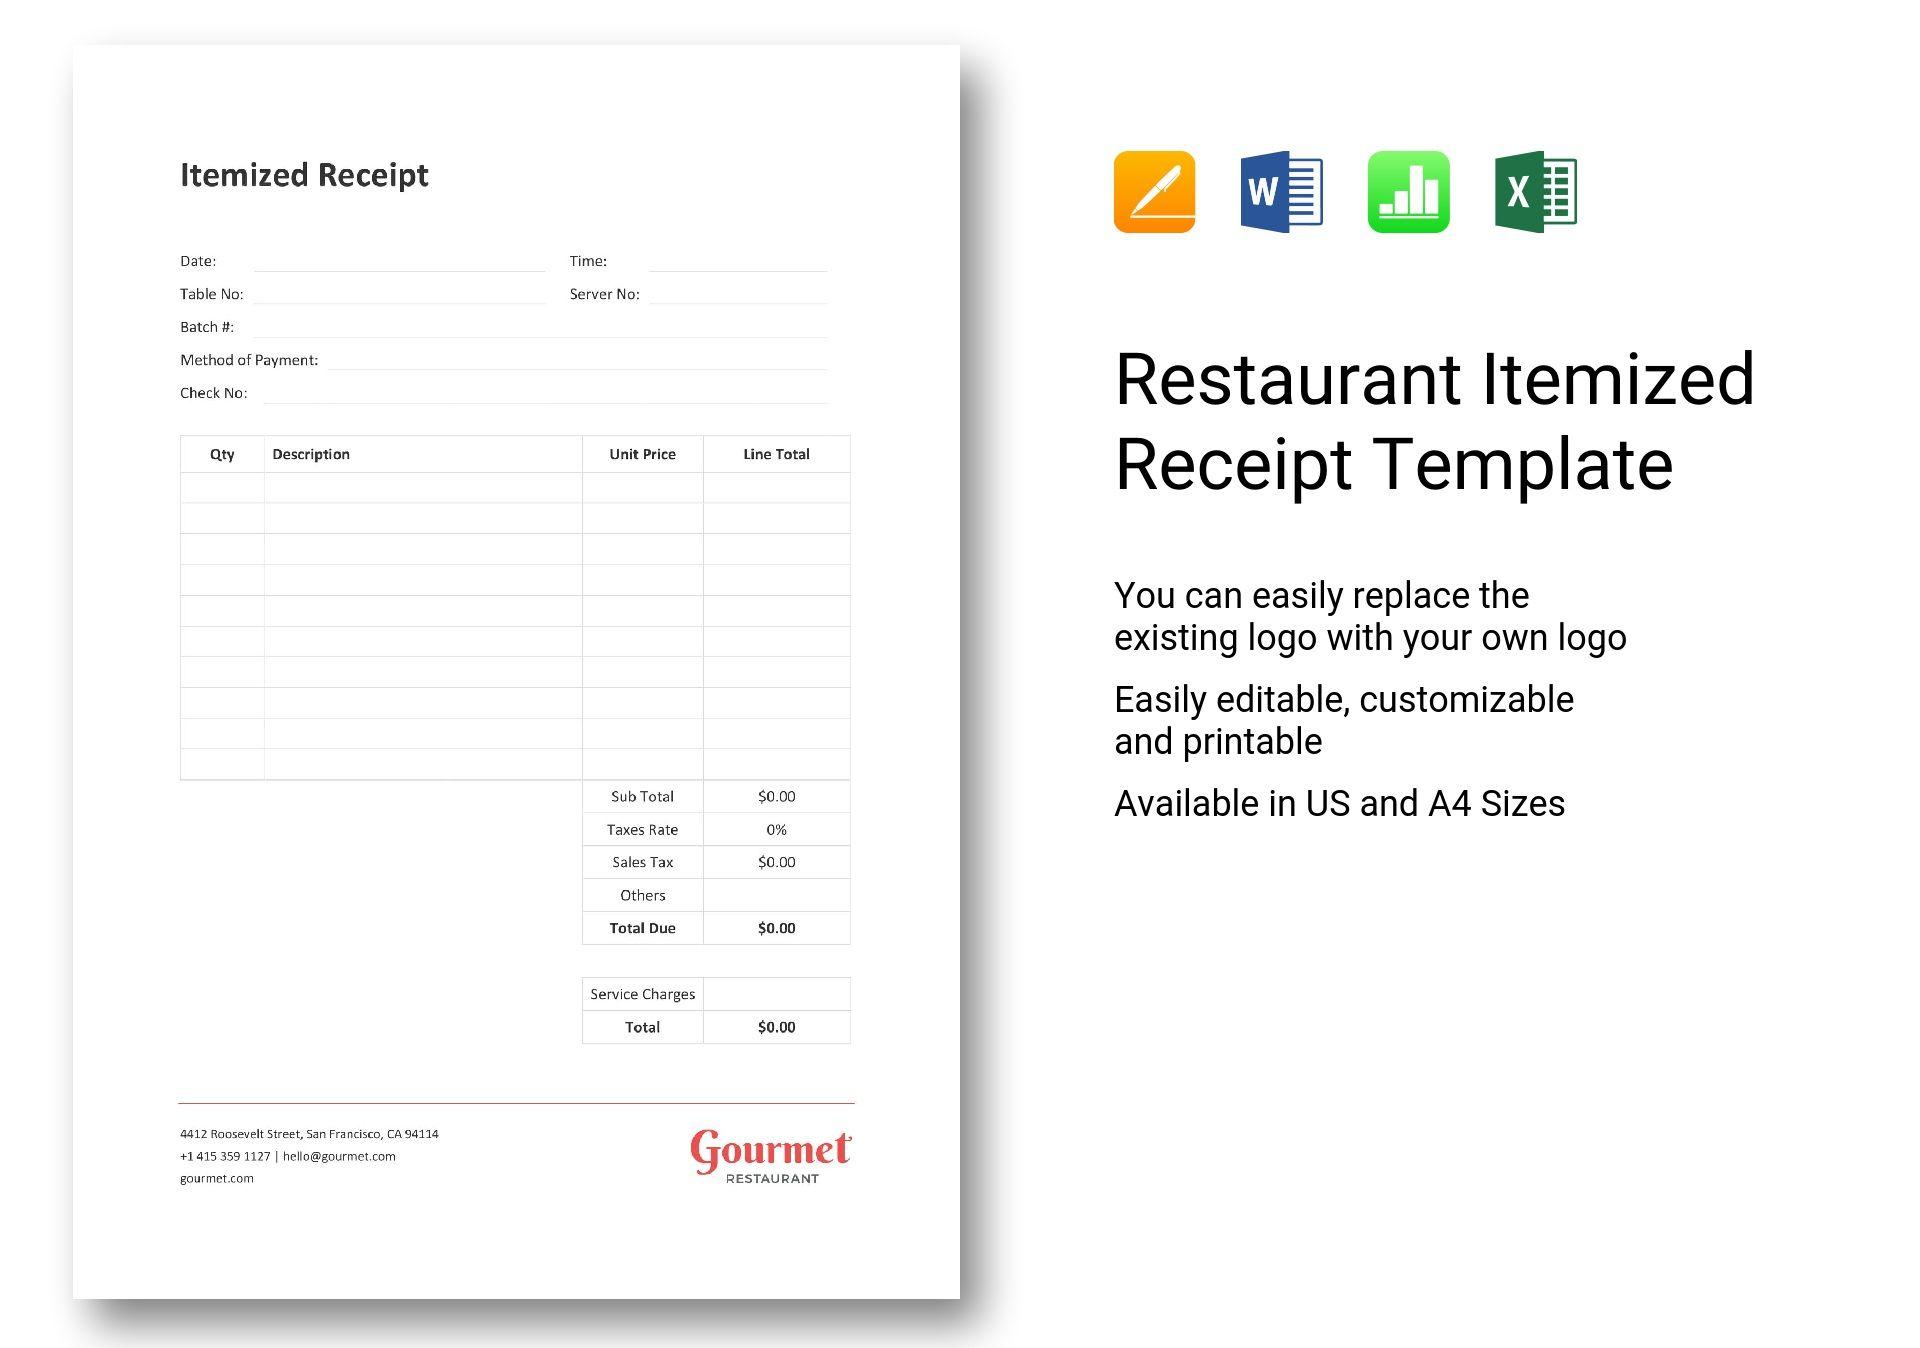 Restaurant Itemized Receipt